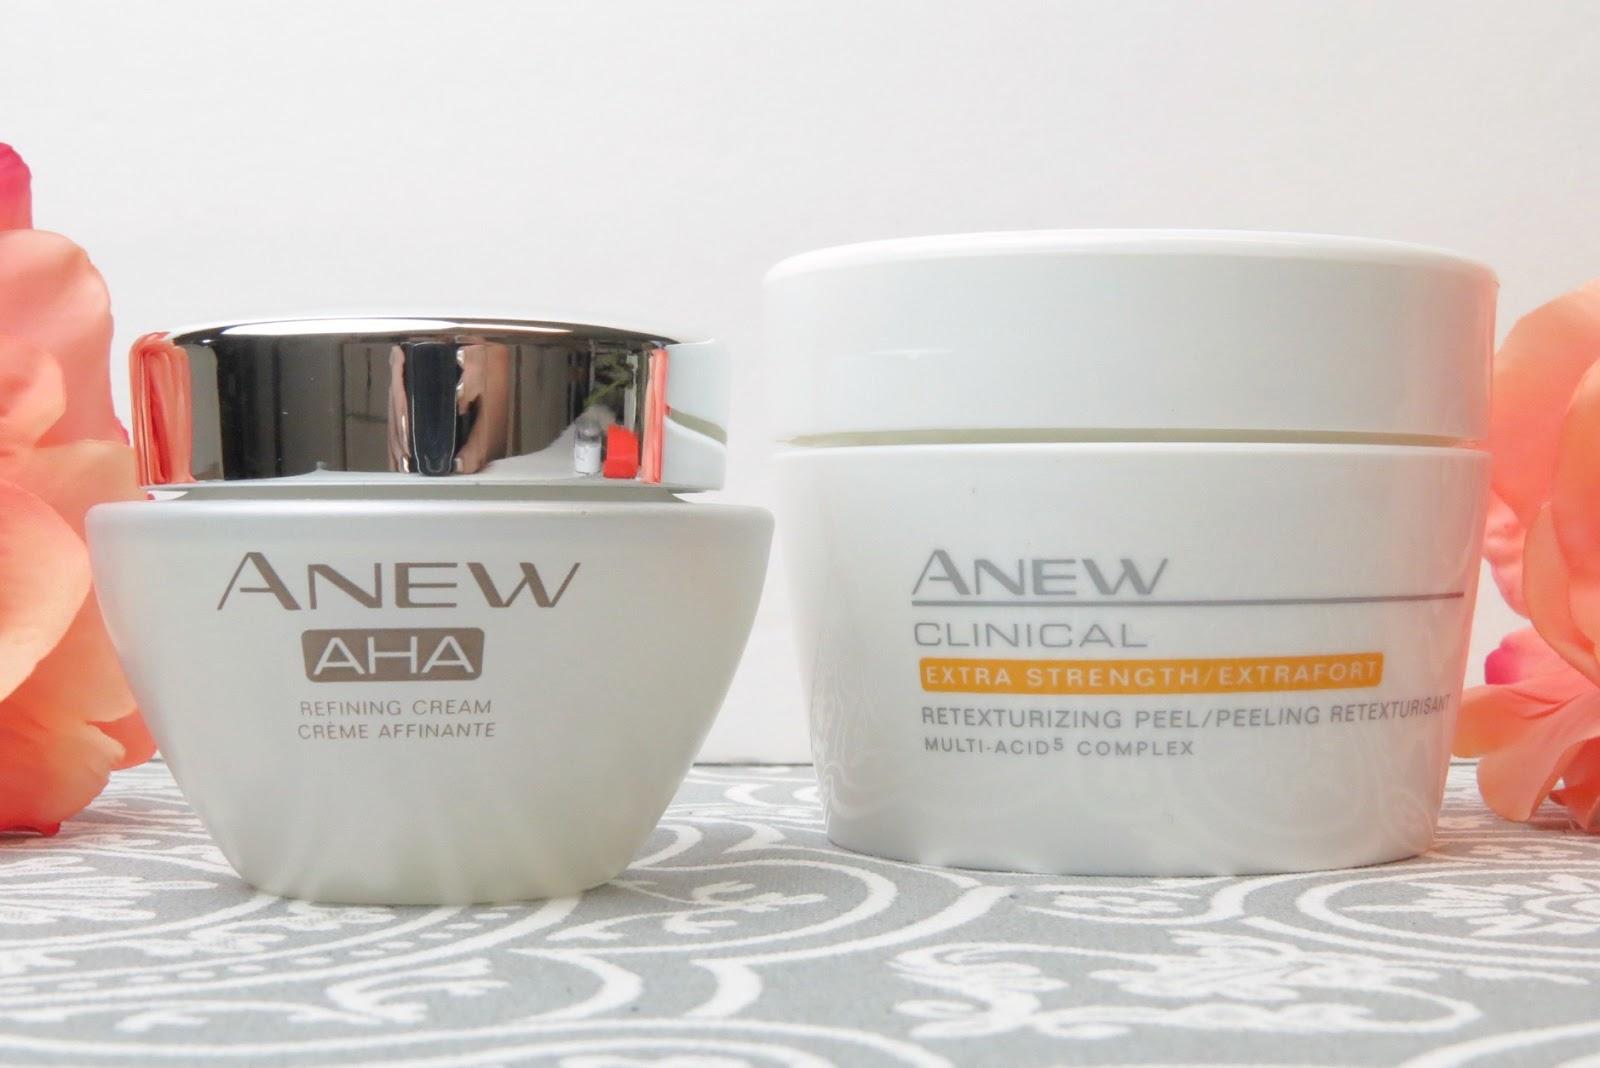 Review: Anew AHA Skincare